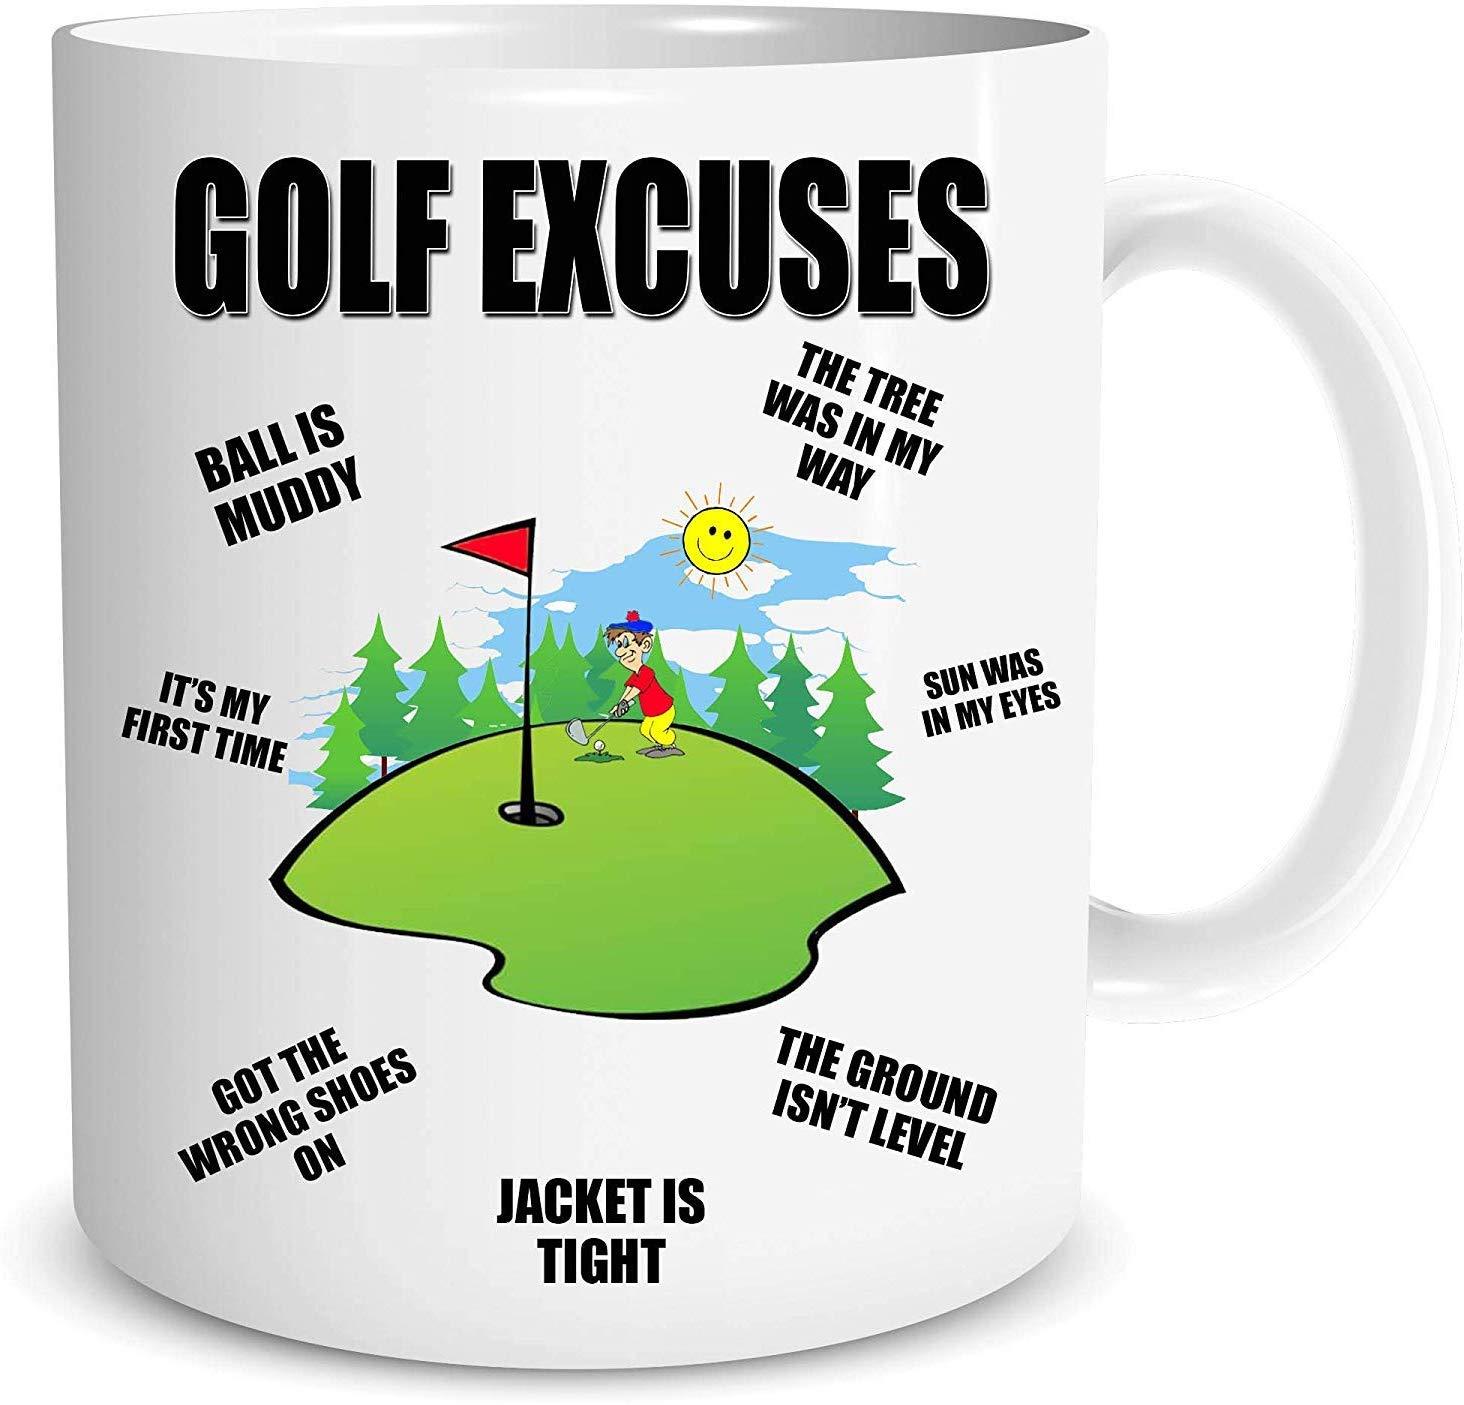 Funny Novelty Golf Excuses Tea Coffee Mug